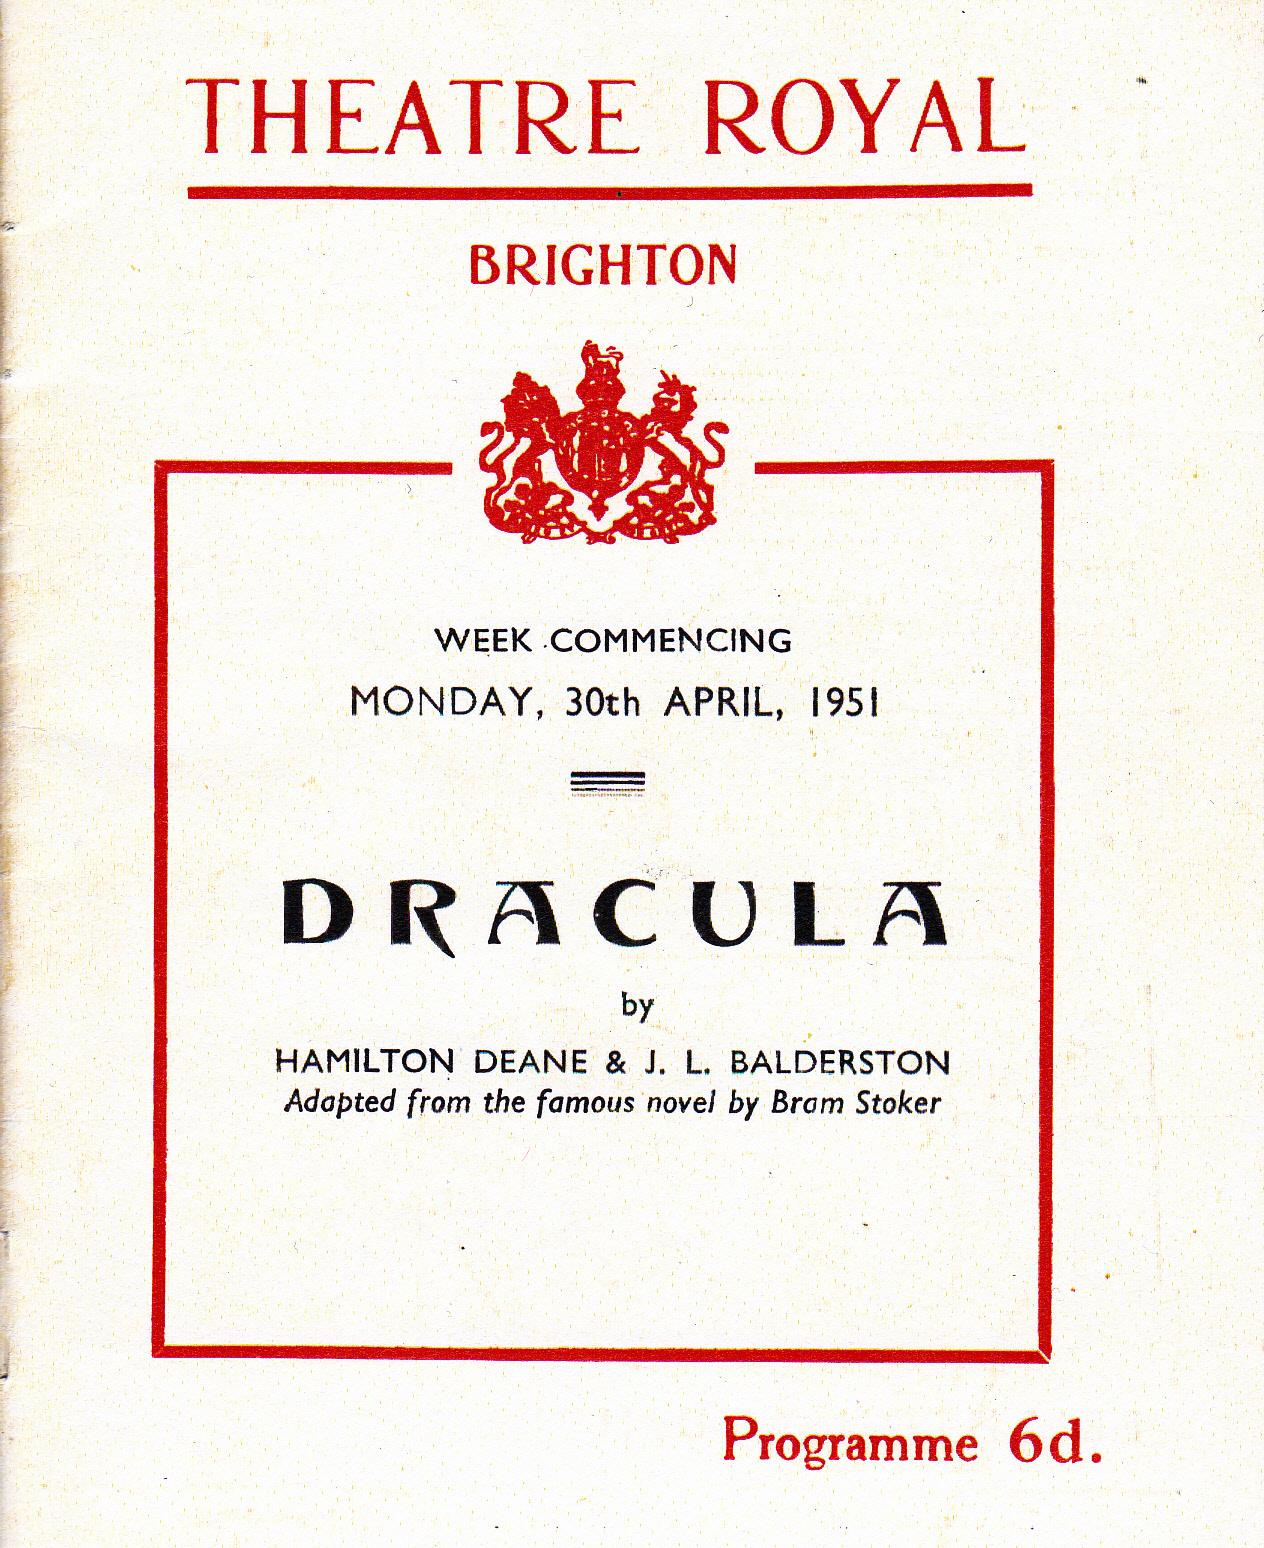 Brighton Programme Cover